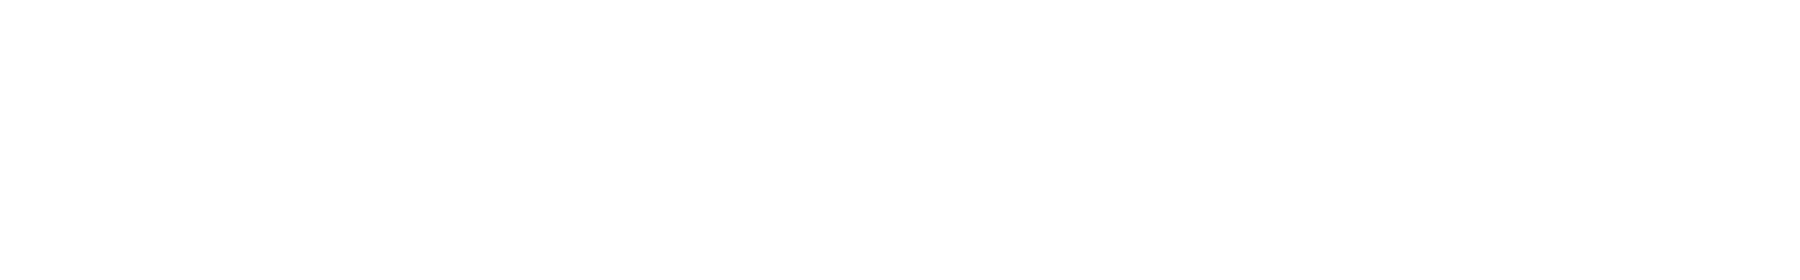 shg music loop 02 p1